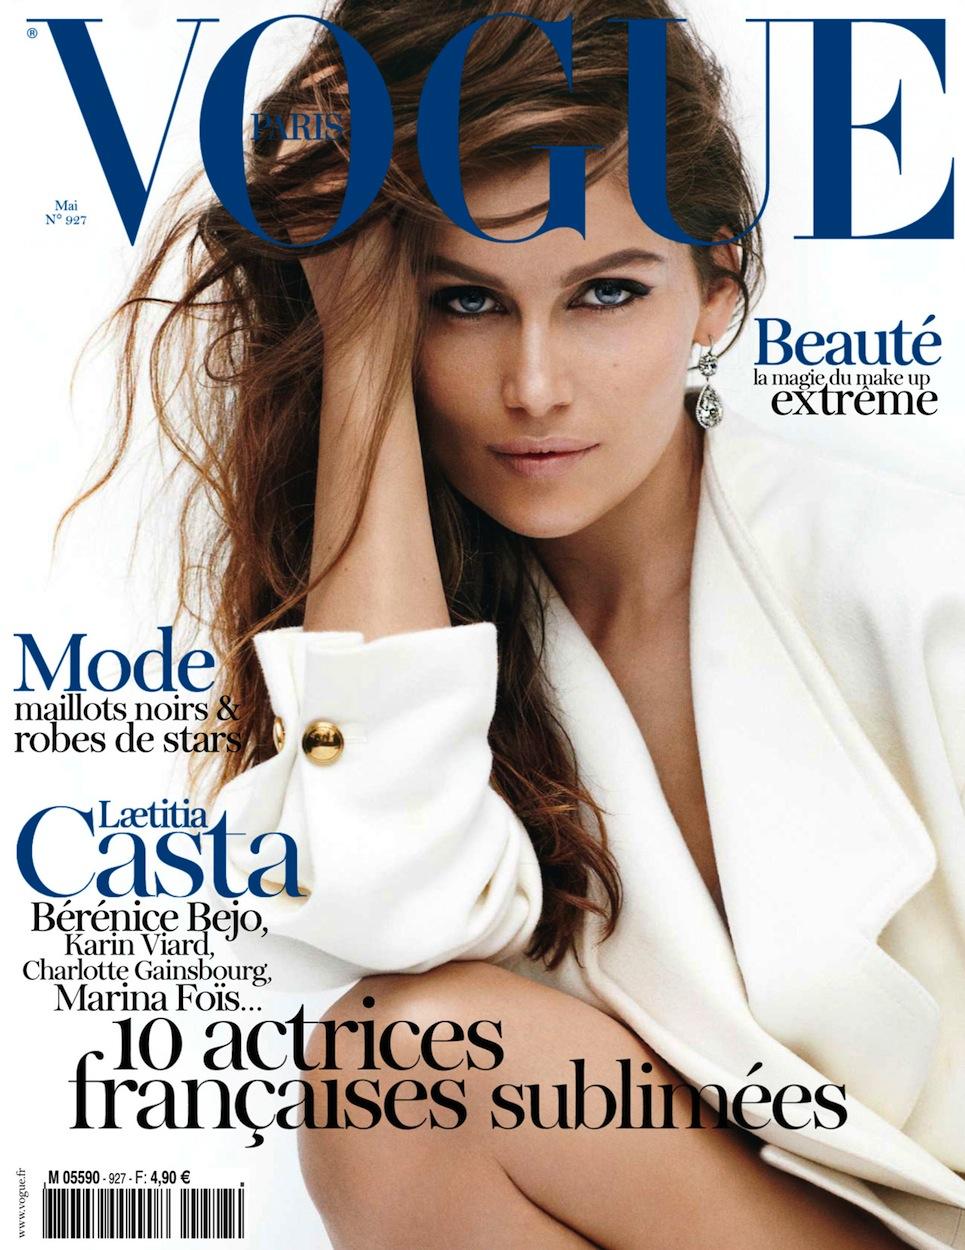 Vogue Paris May 2012: Laetitia Casta by Mario Testino